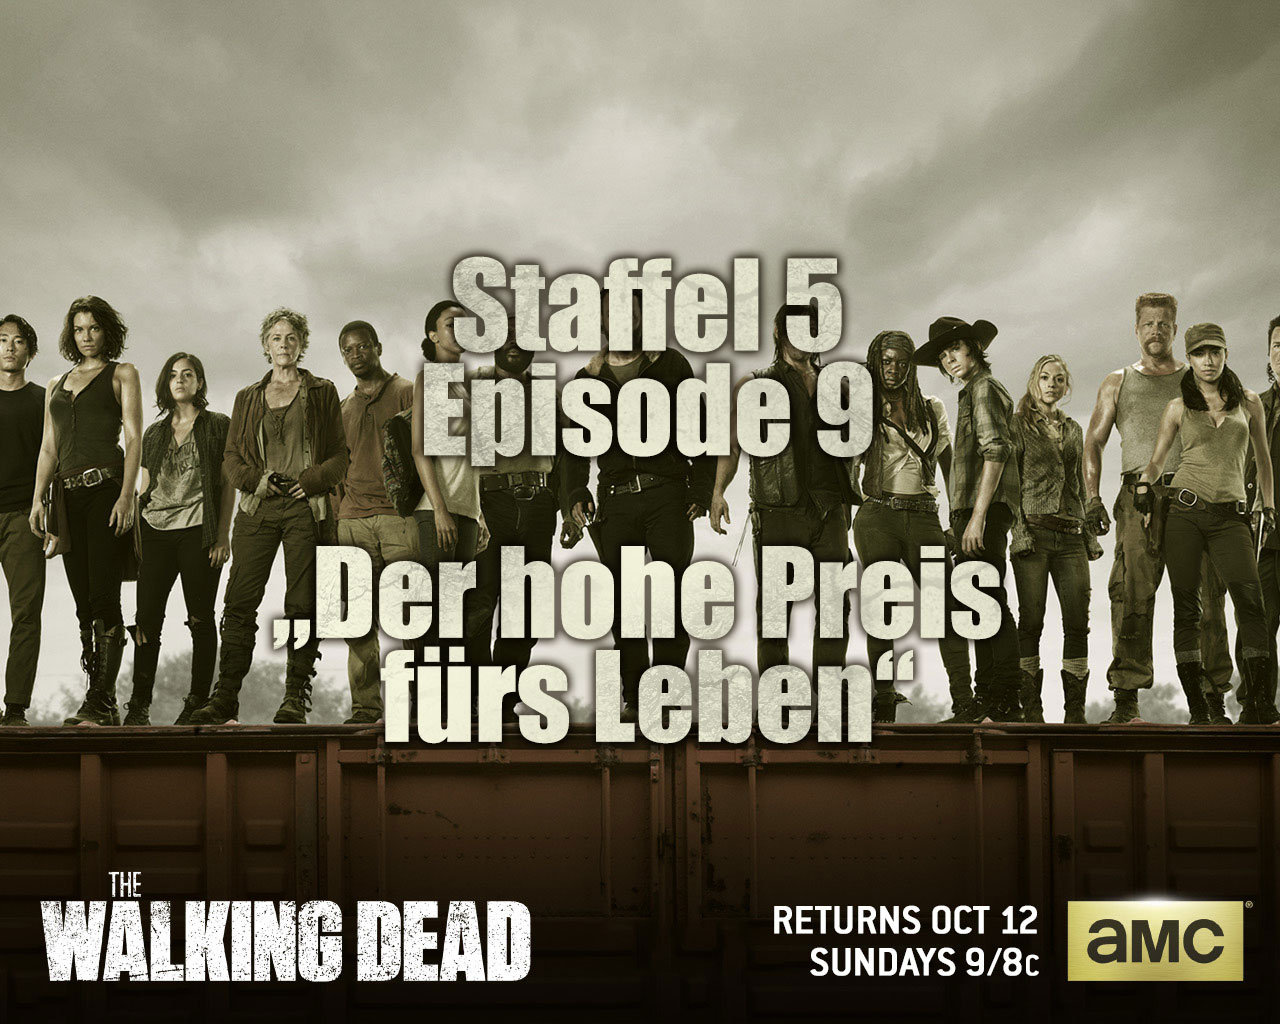 The Walking Dead S05E09 – Der hohe Preis fürs Leben